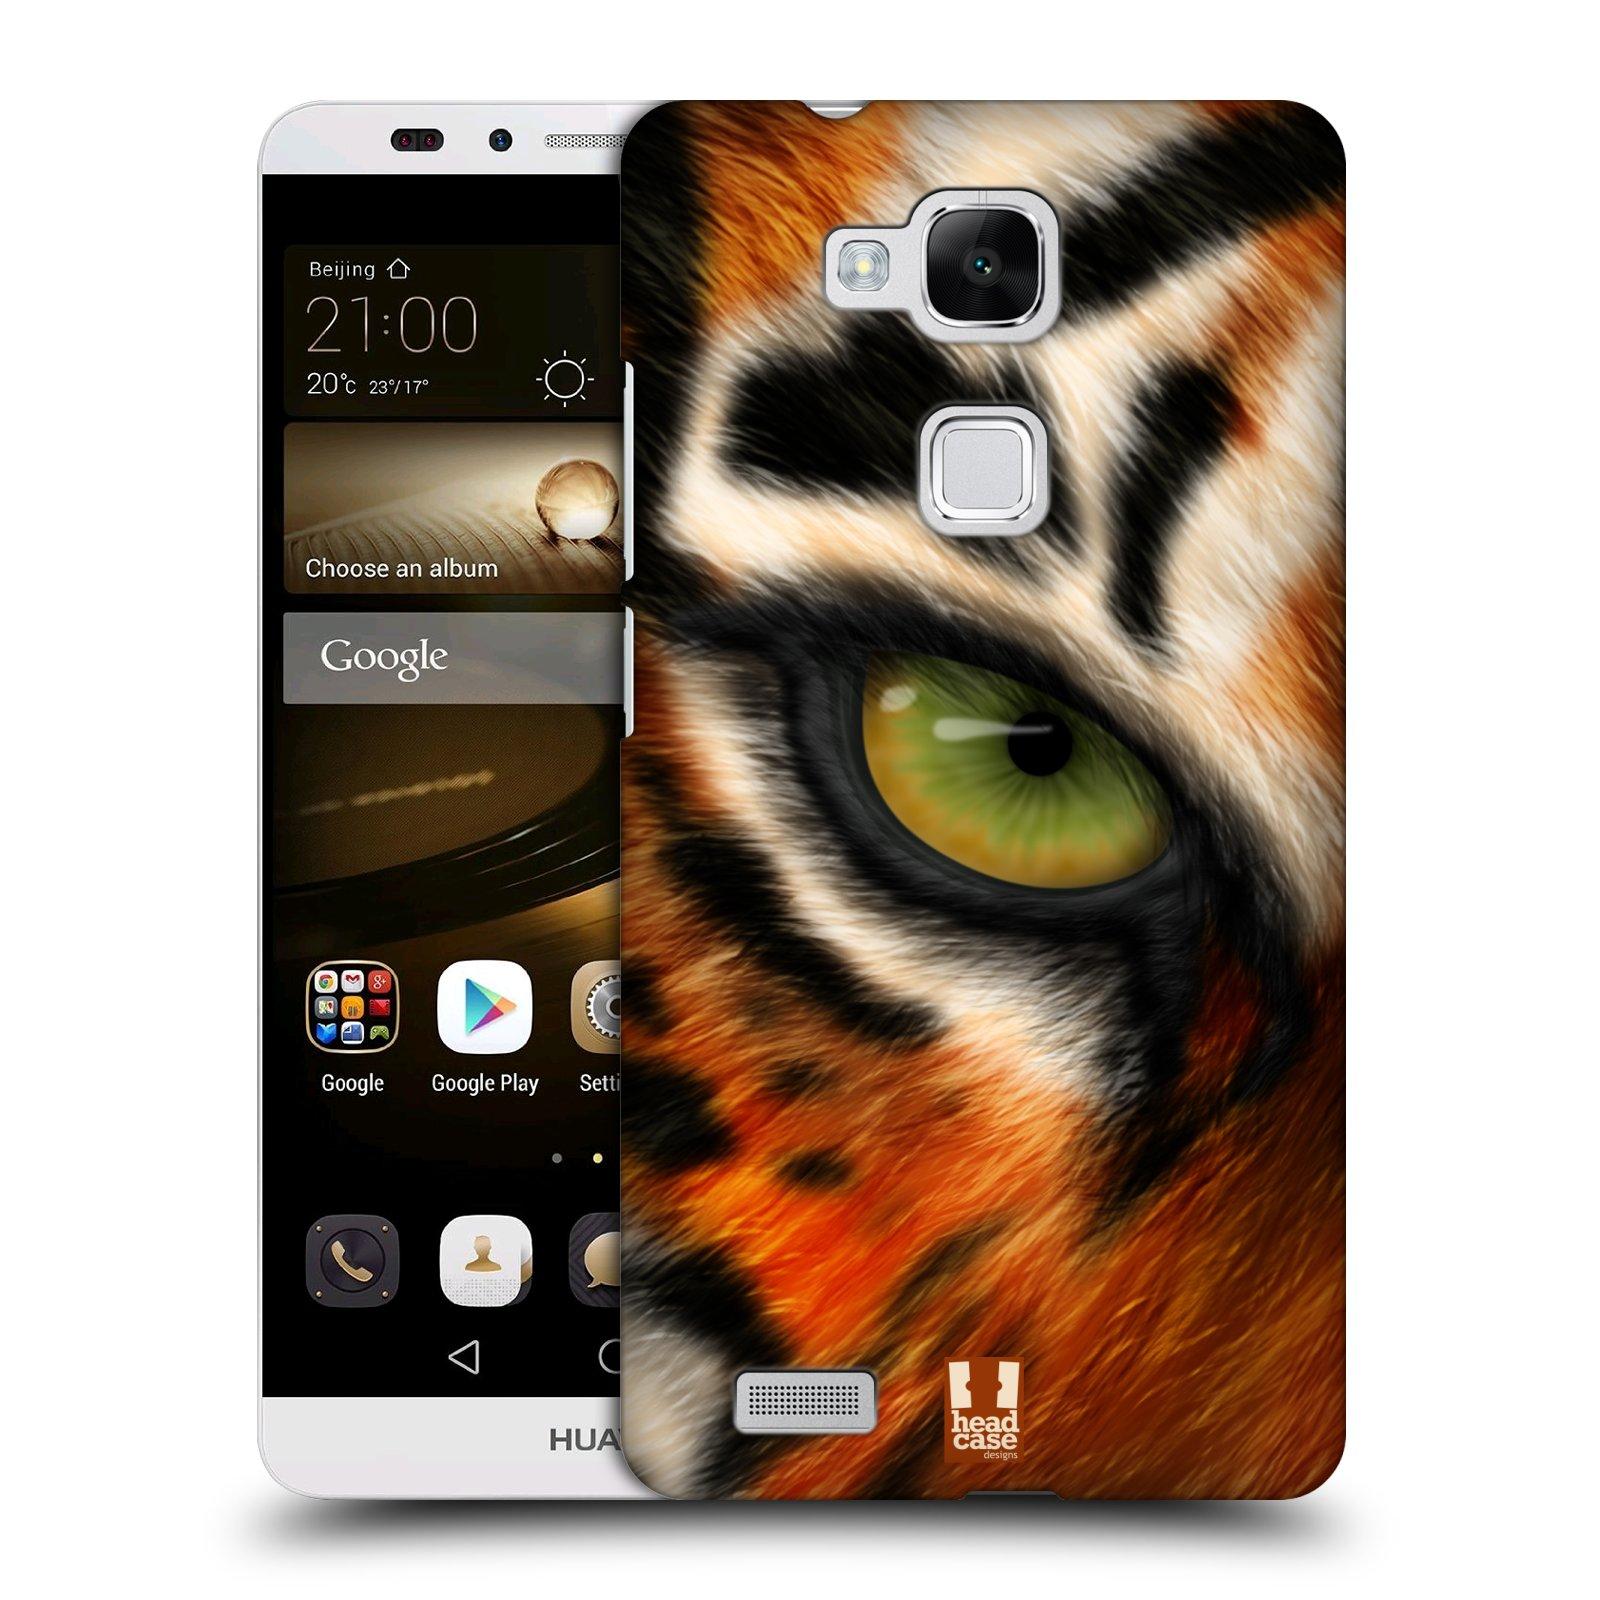 HEAD CASE plastový obal na mobil Huawei Mate 7 vzor pohled zvířete oko tygr